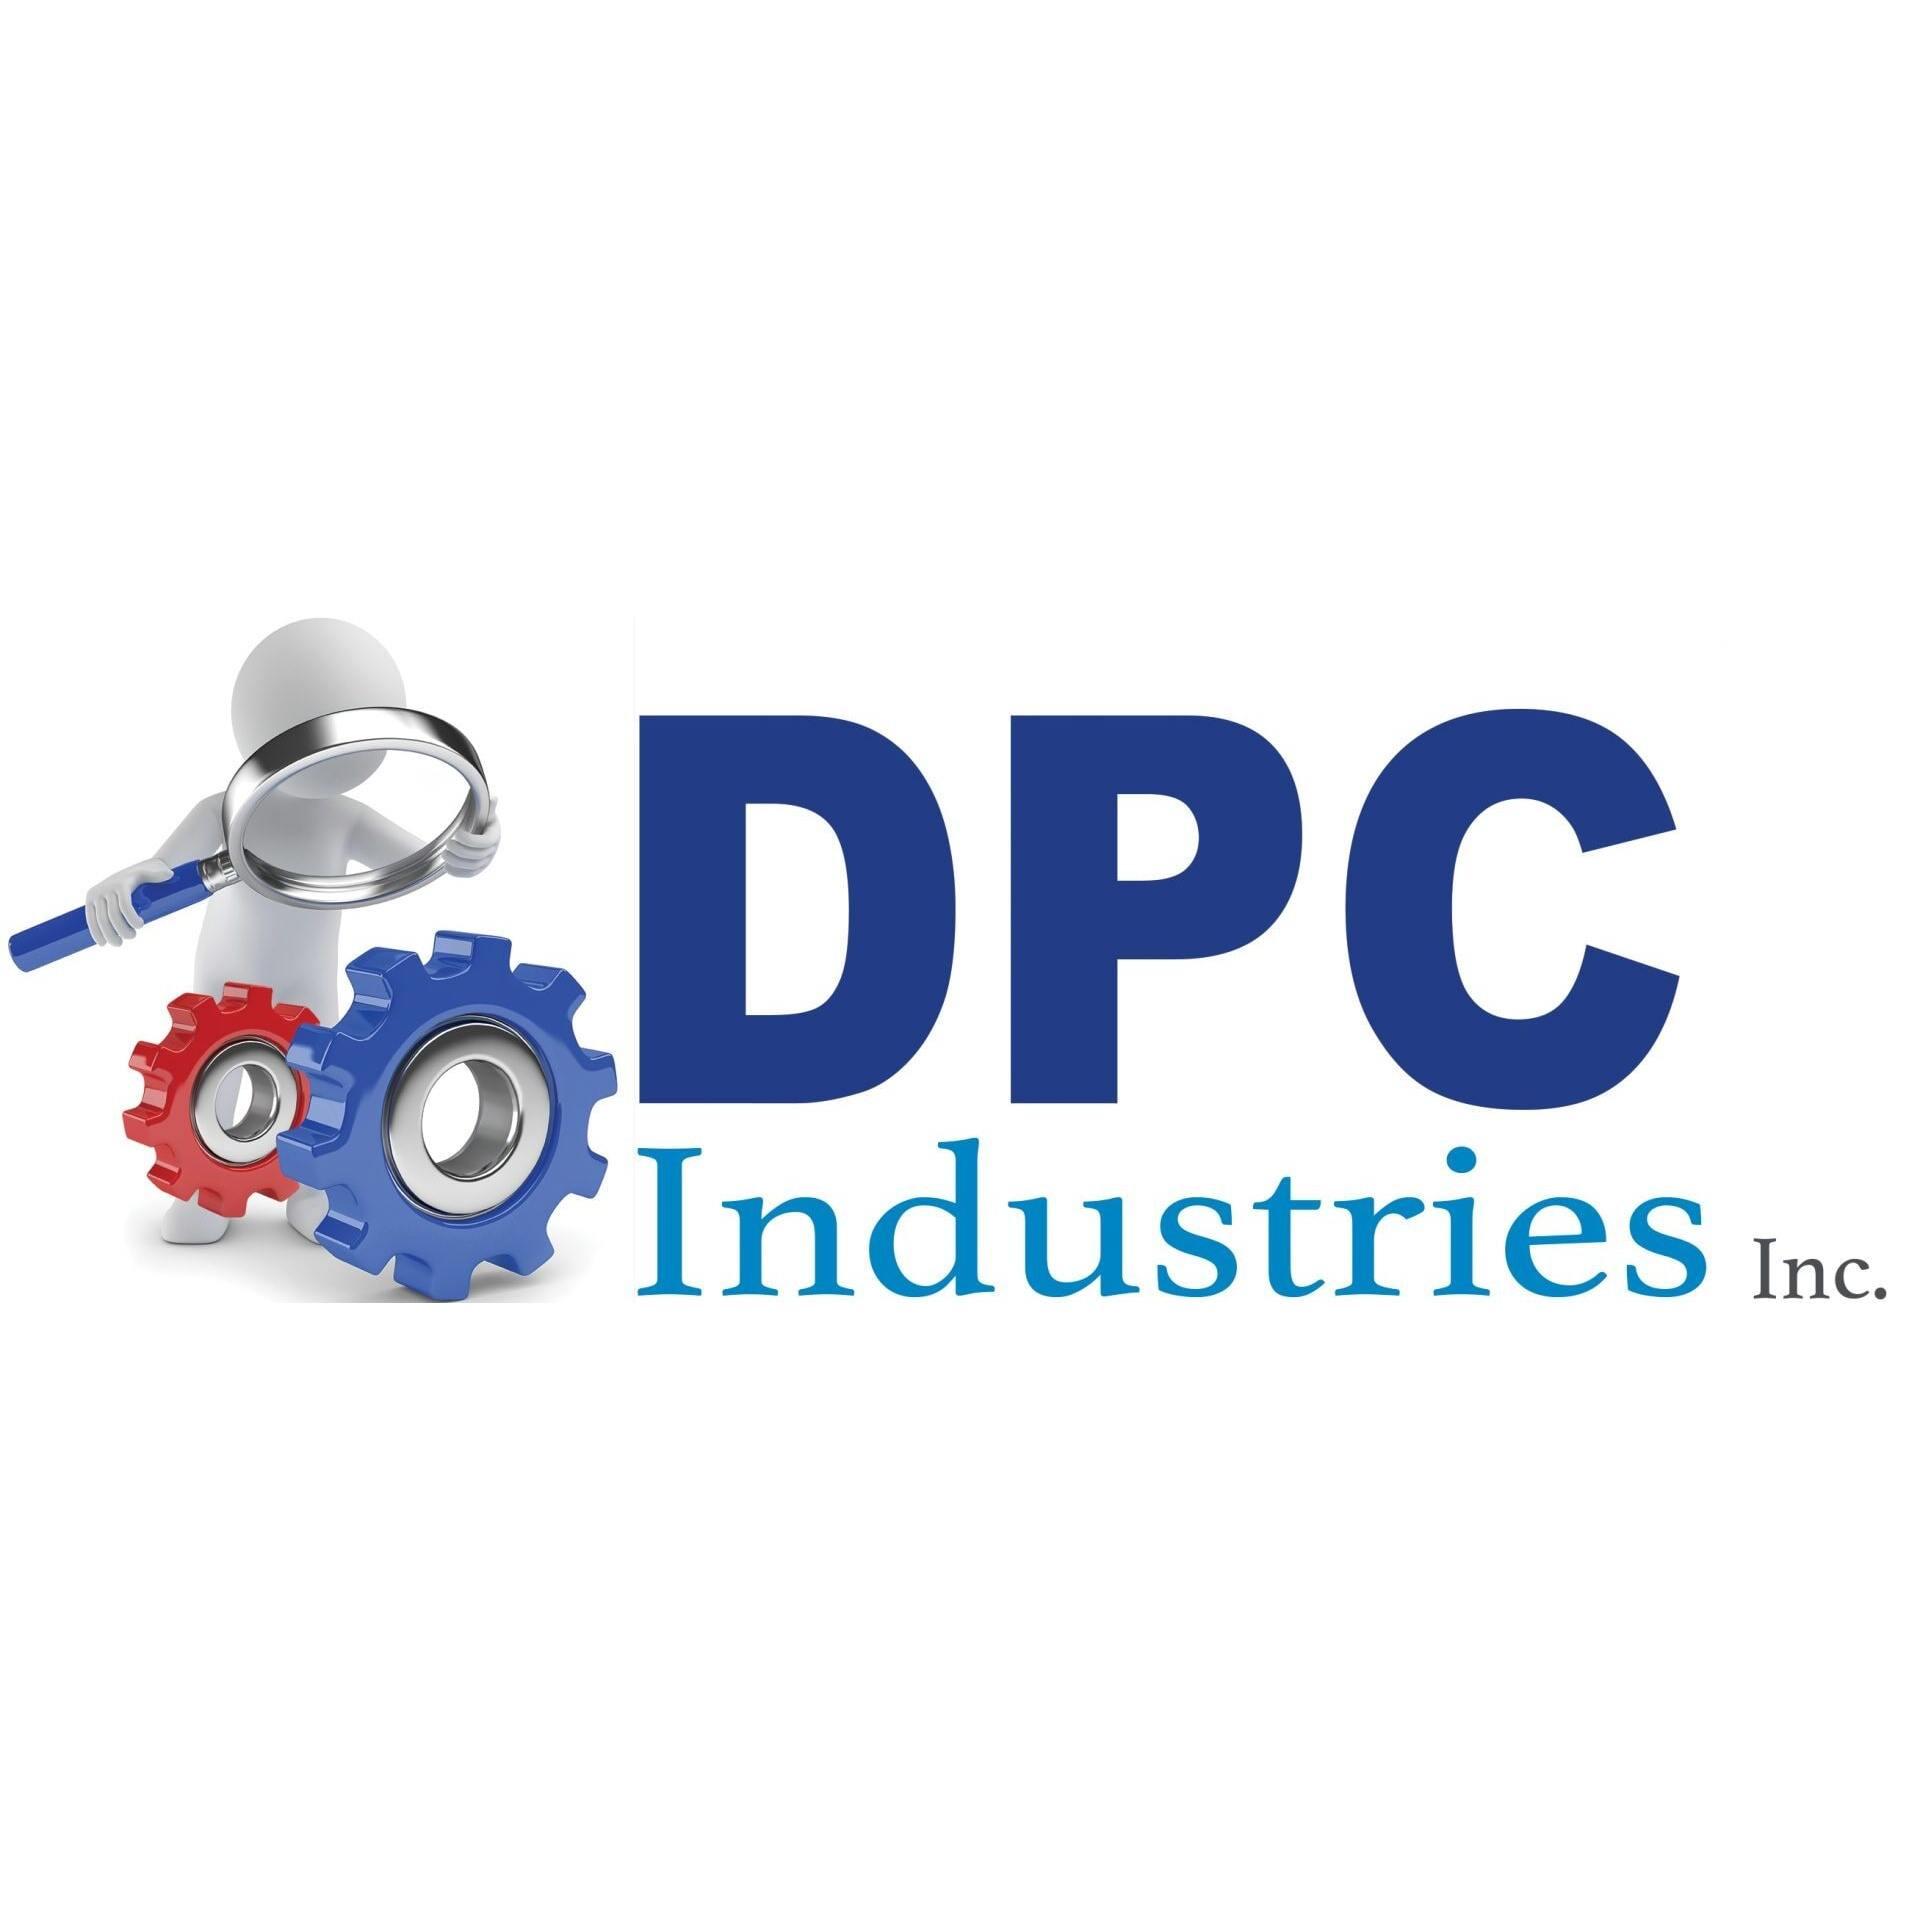 DPC Industries, Inc